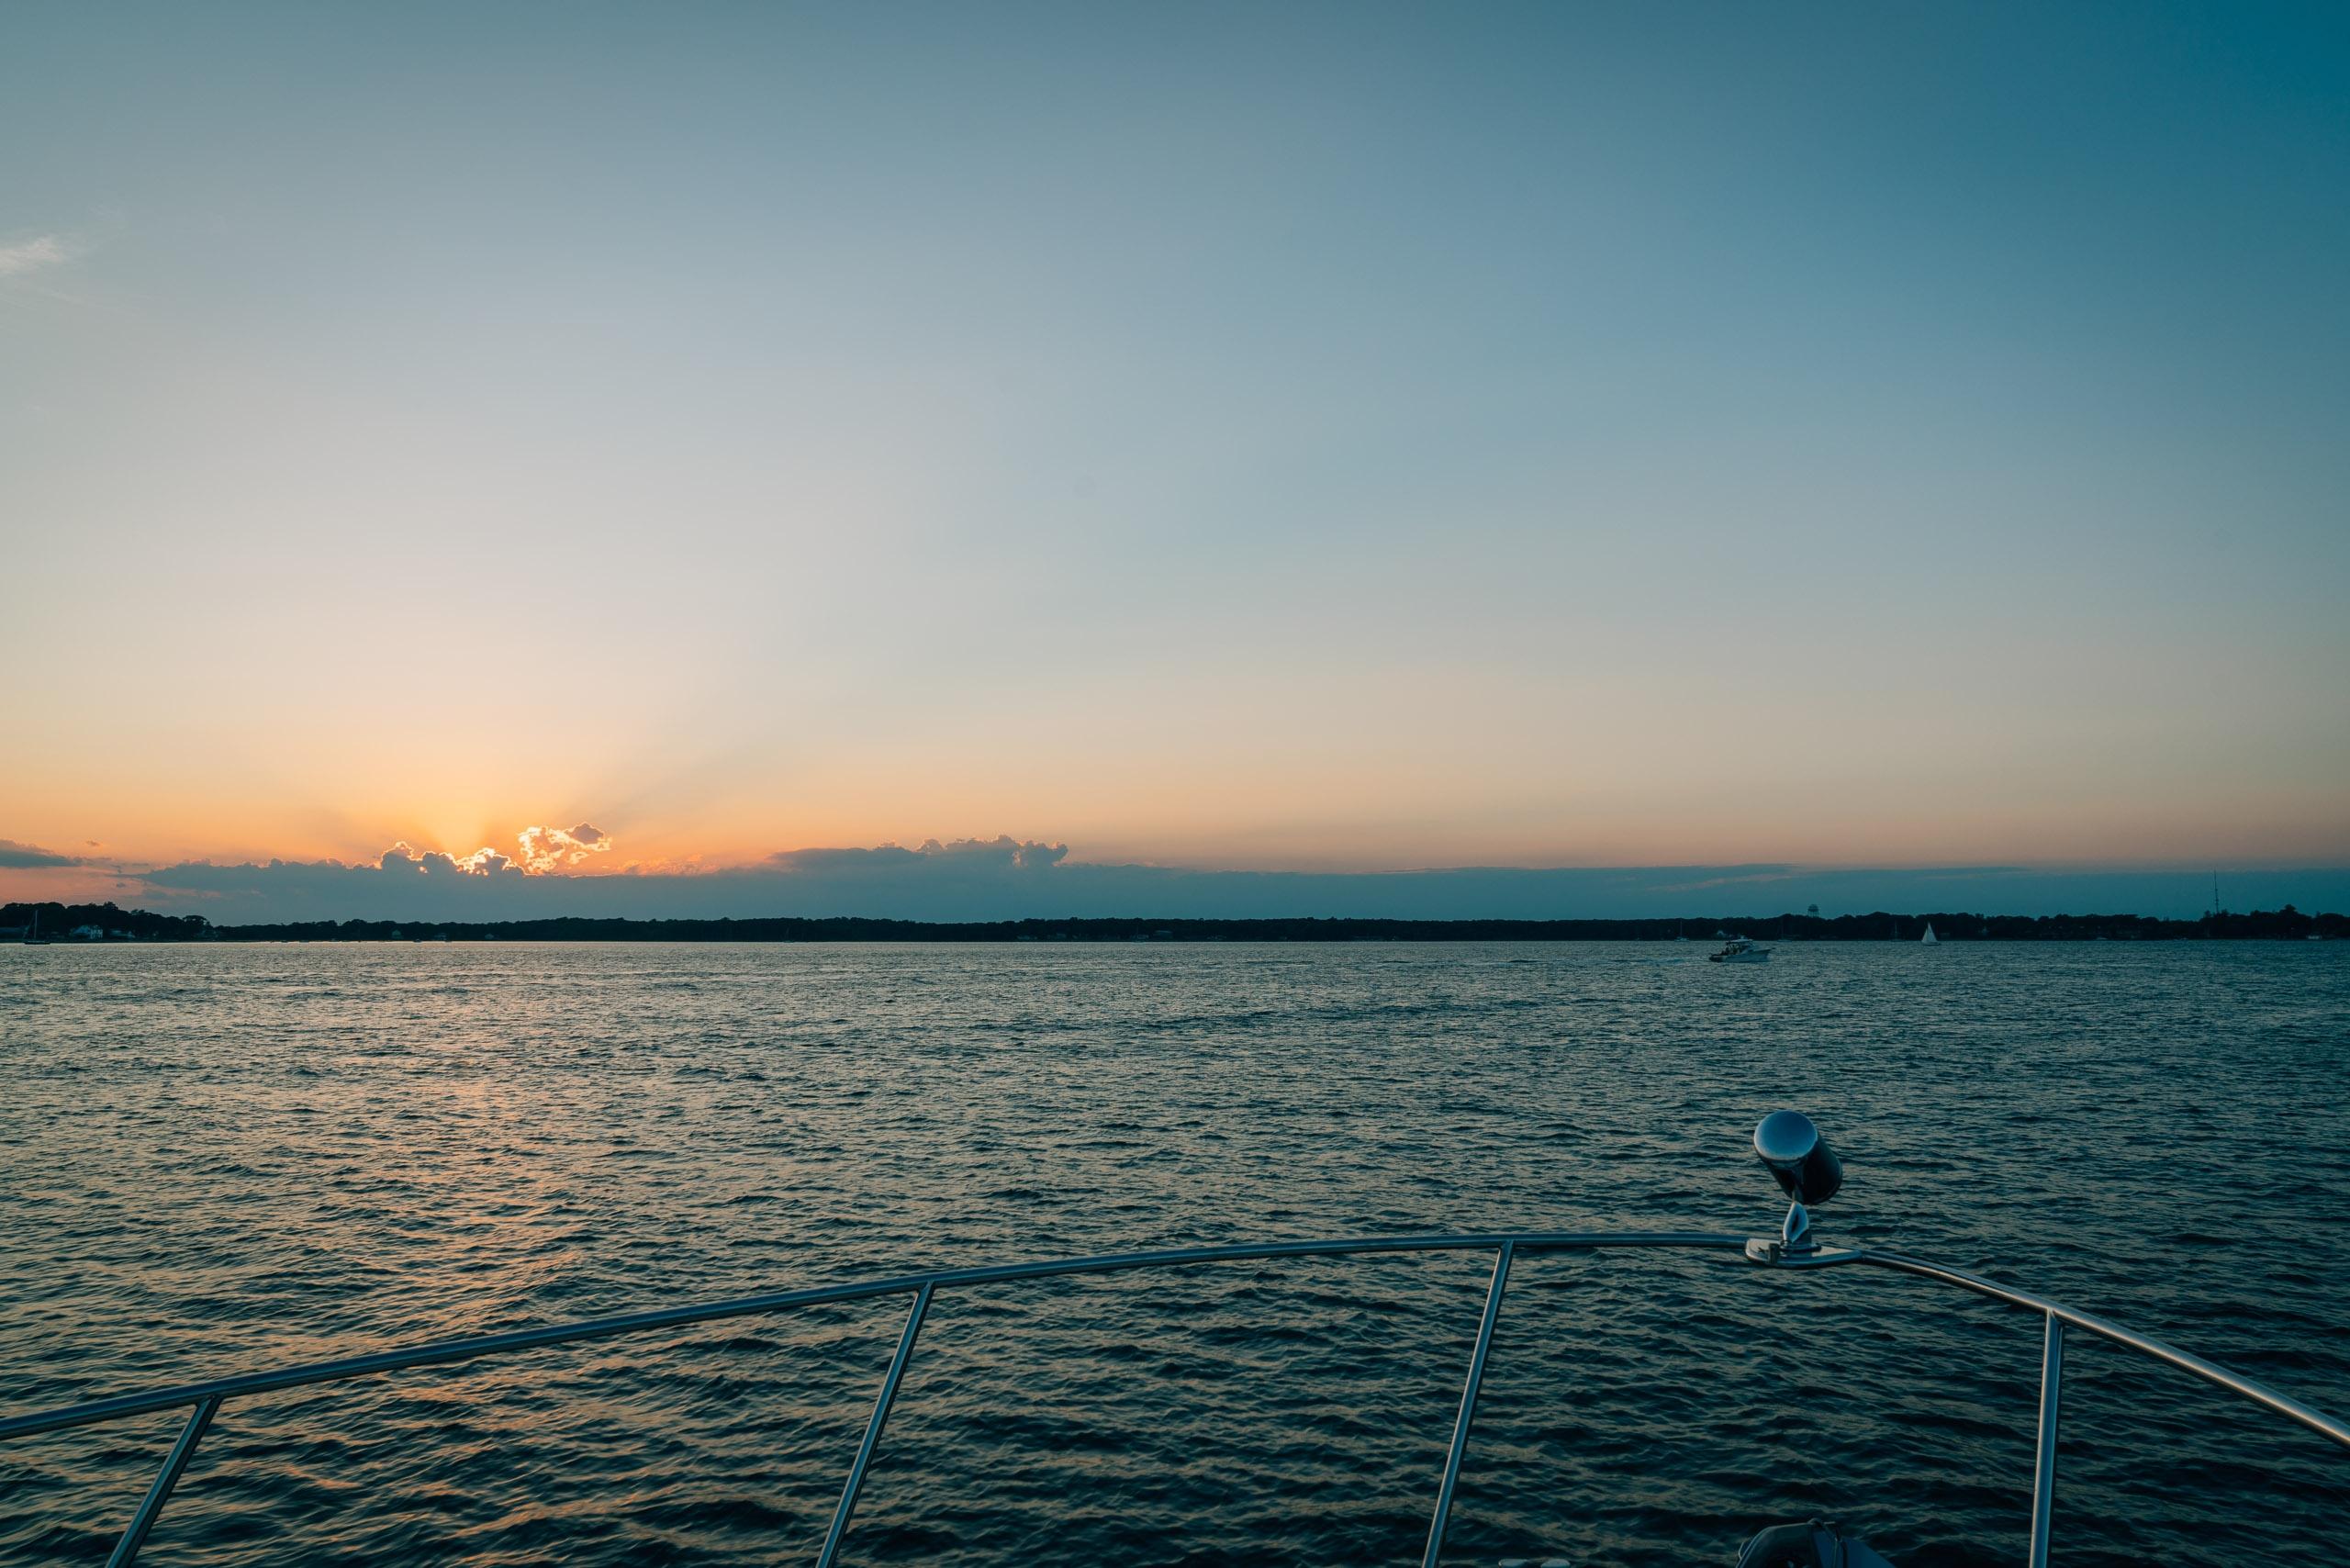 Sunset over Shelter Island